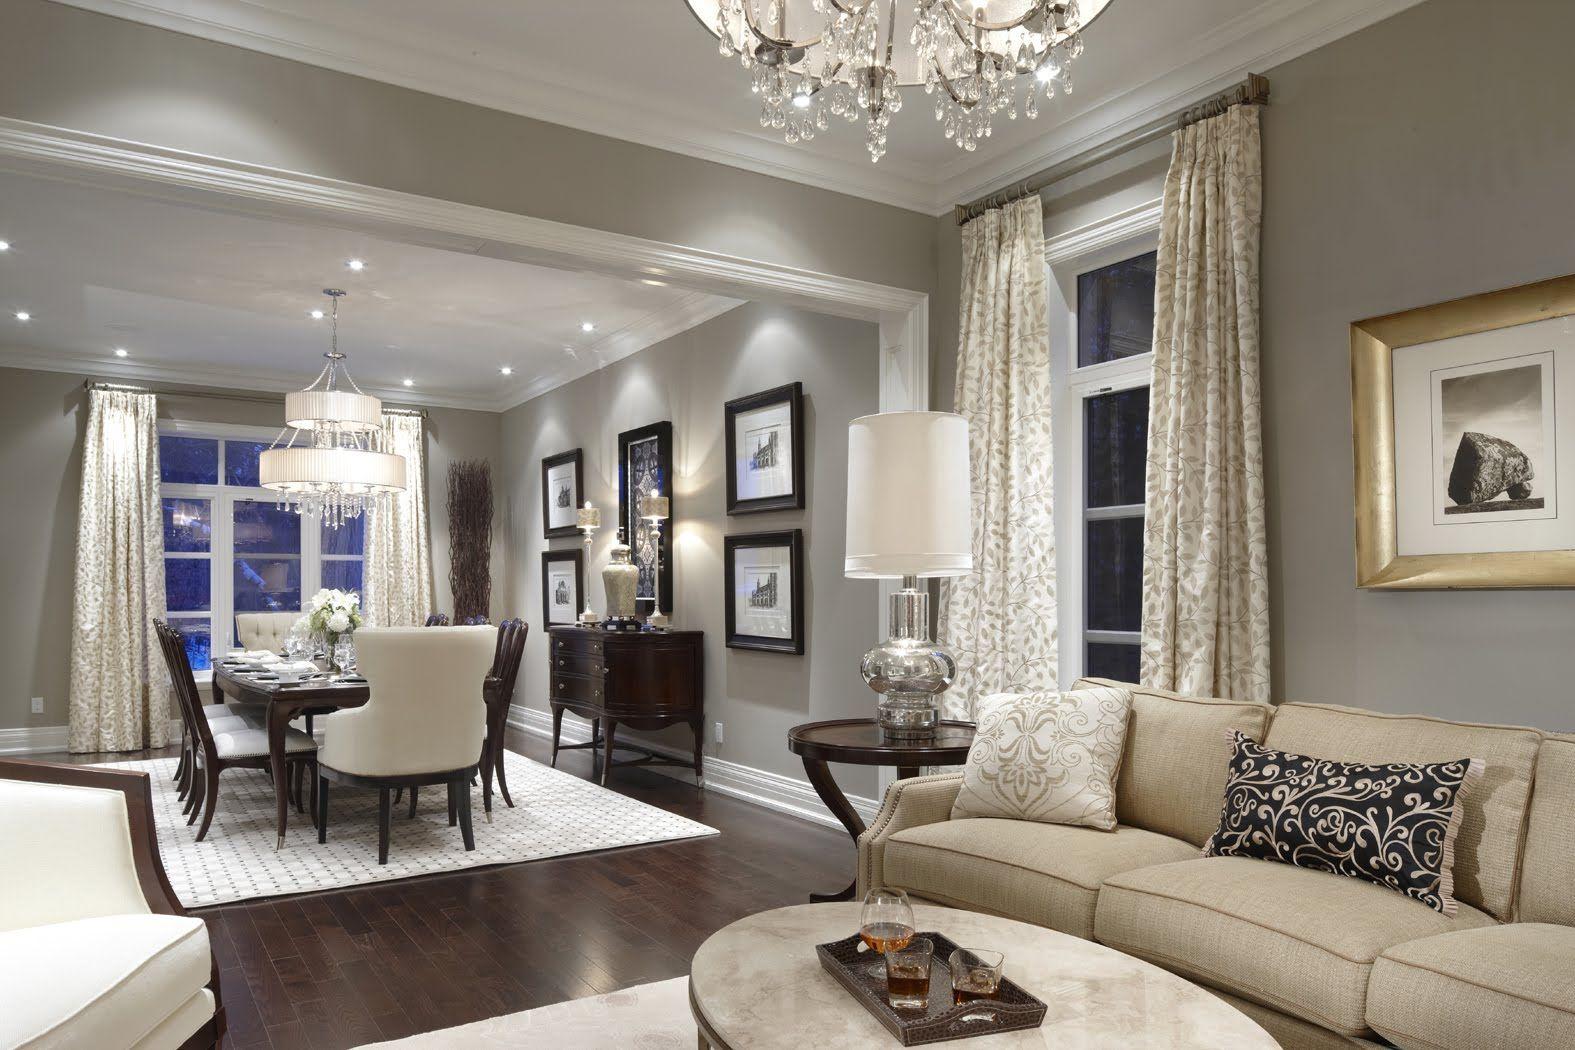 Dark Floors Grey Walls Living Room Leather Furniture Set Benjamin Moore Colors For Your Decor Livingroom Ideas A Traditional With Medium Tone Hardwood